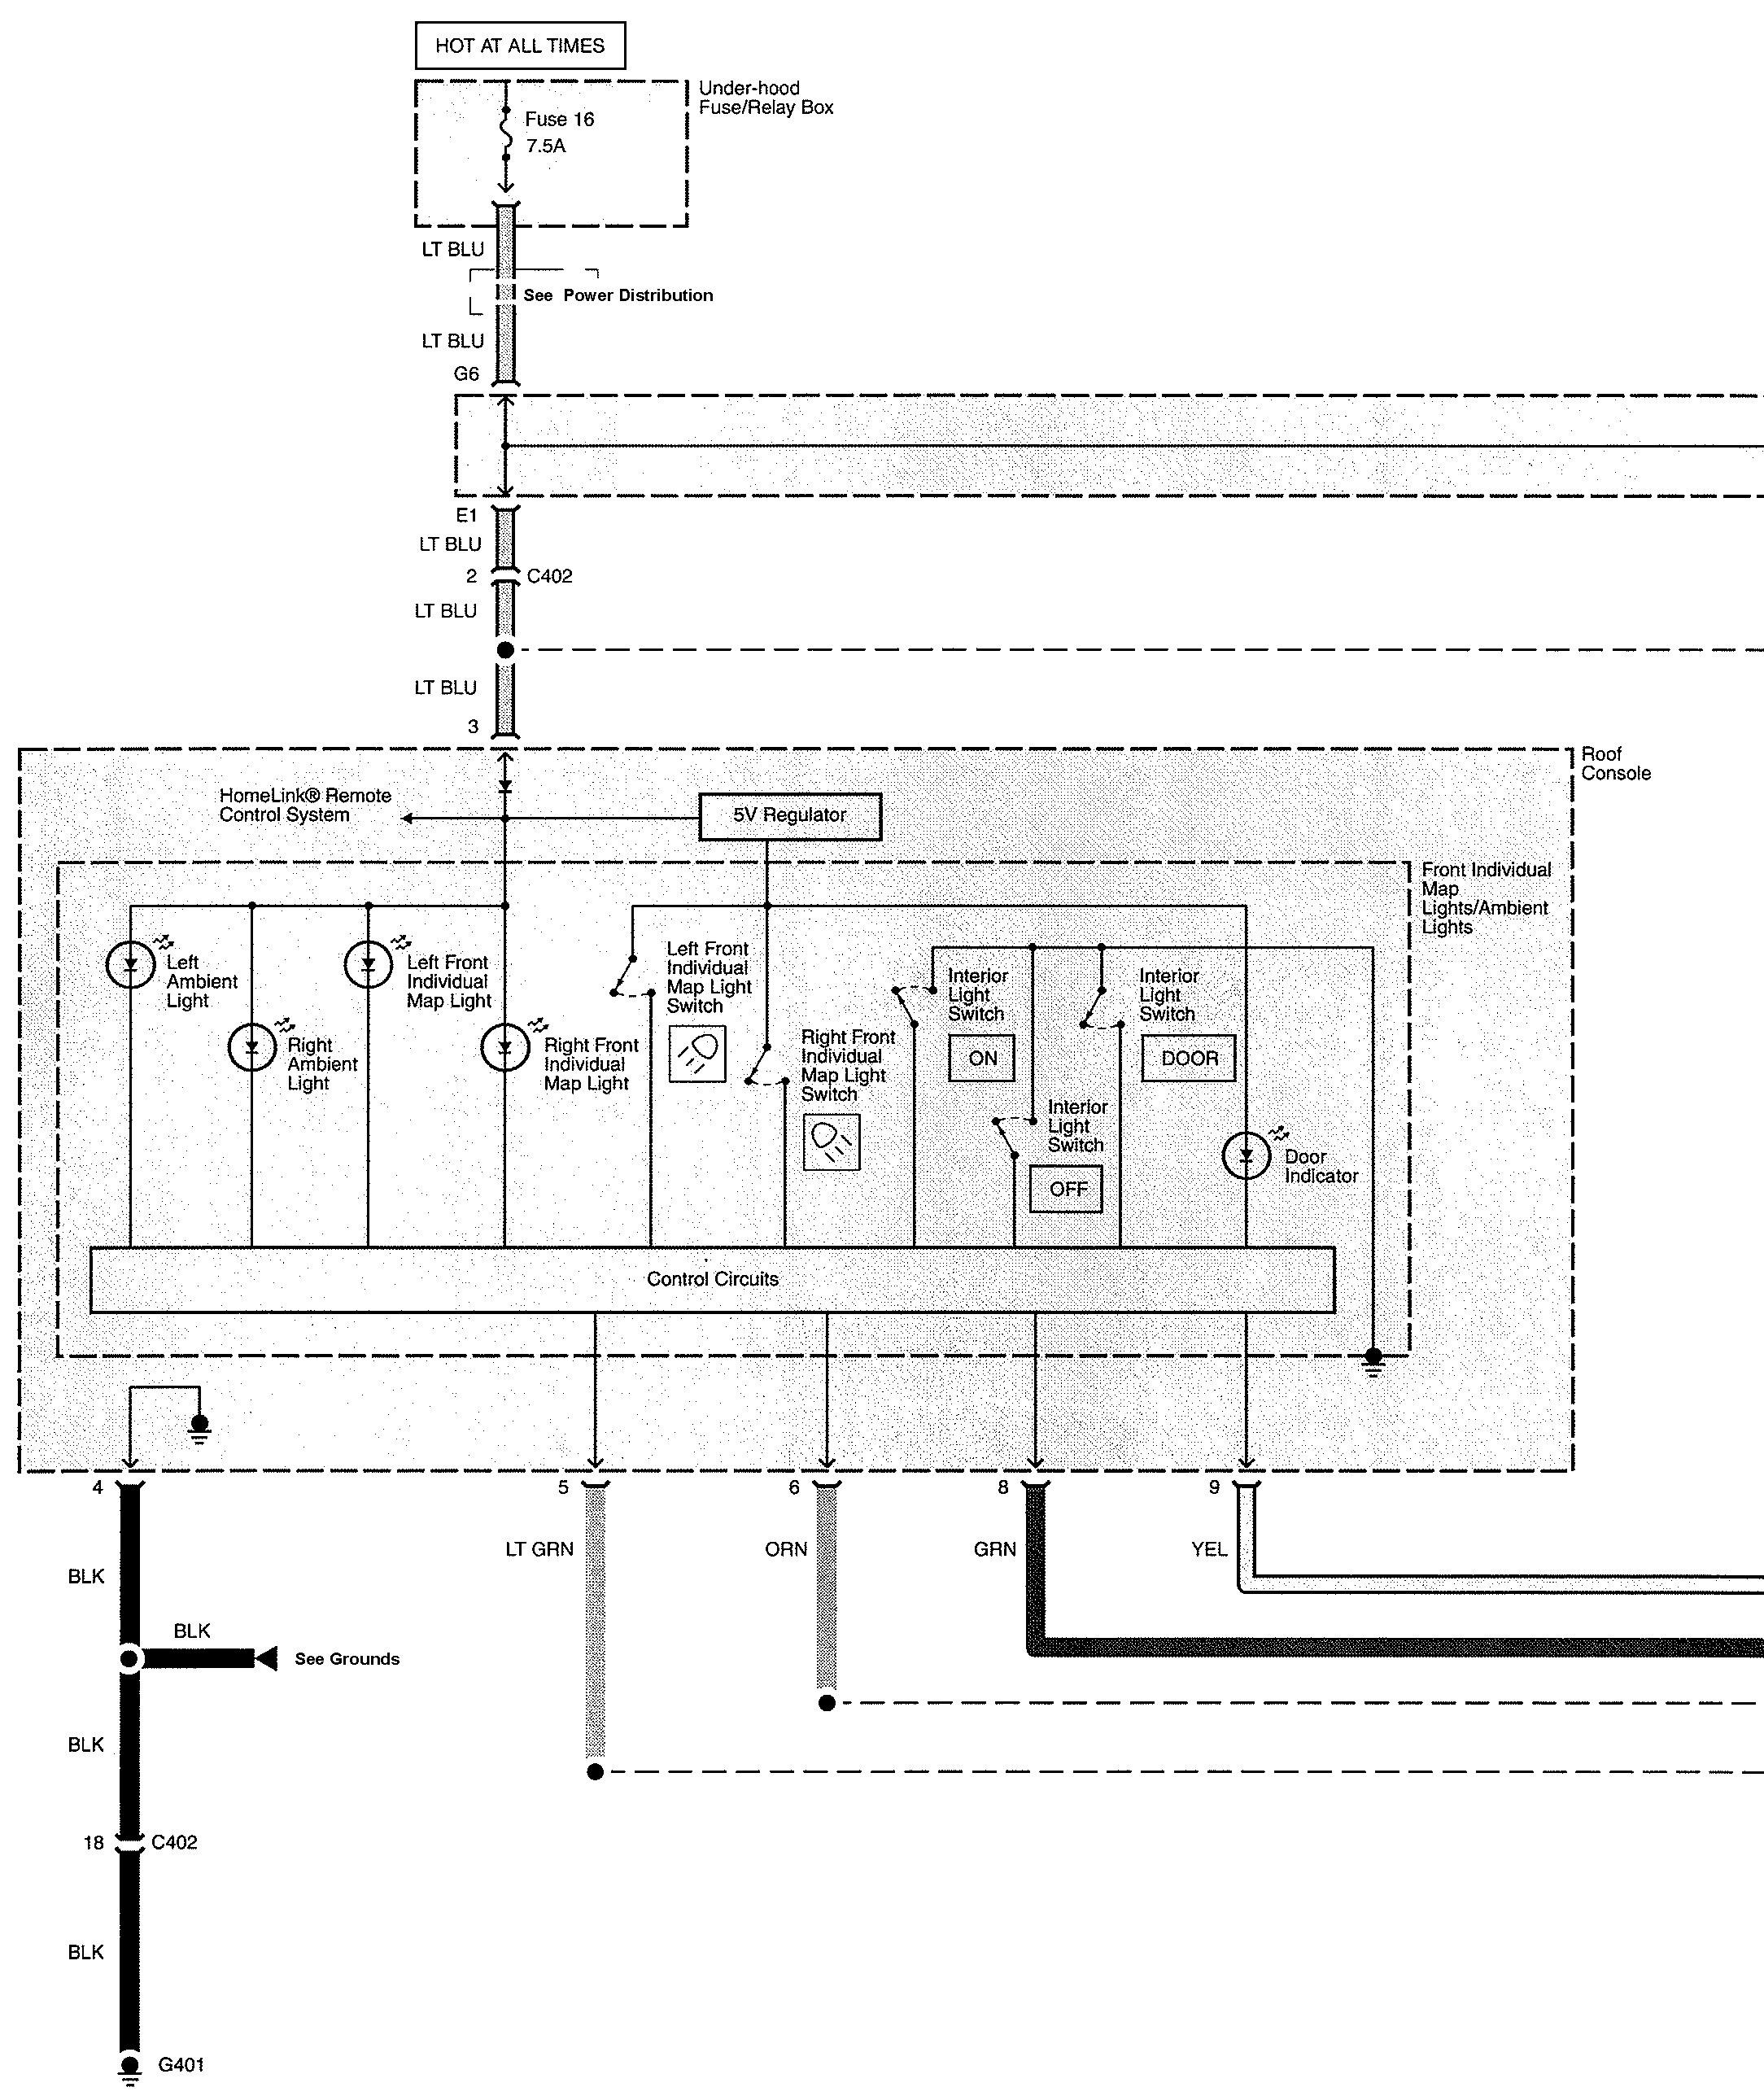 Acura Tl 2010 Wiring Diagrams Interior Lighting Carknowledge Diagram Part 1